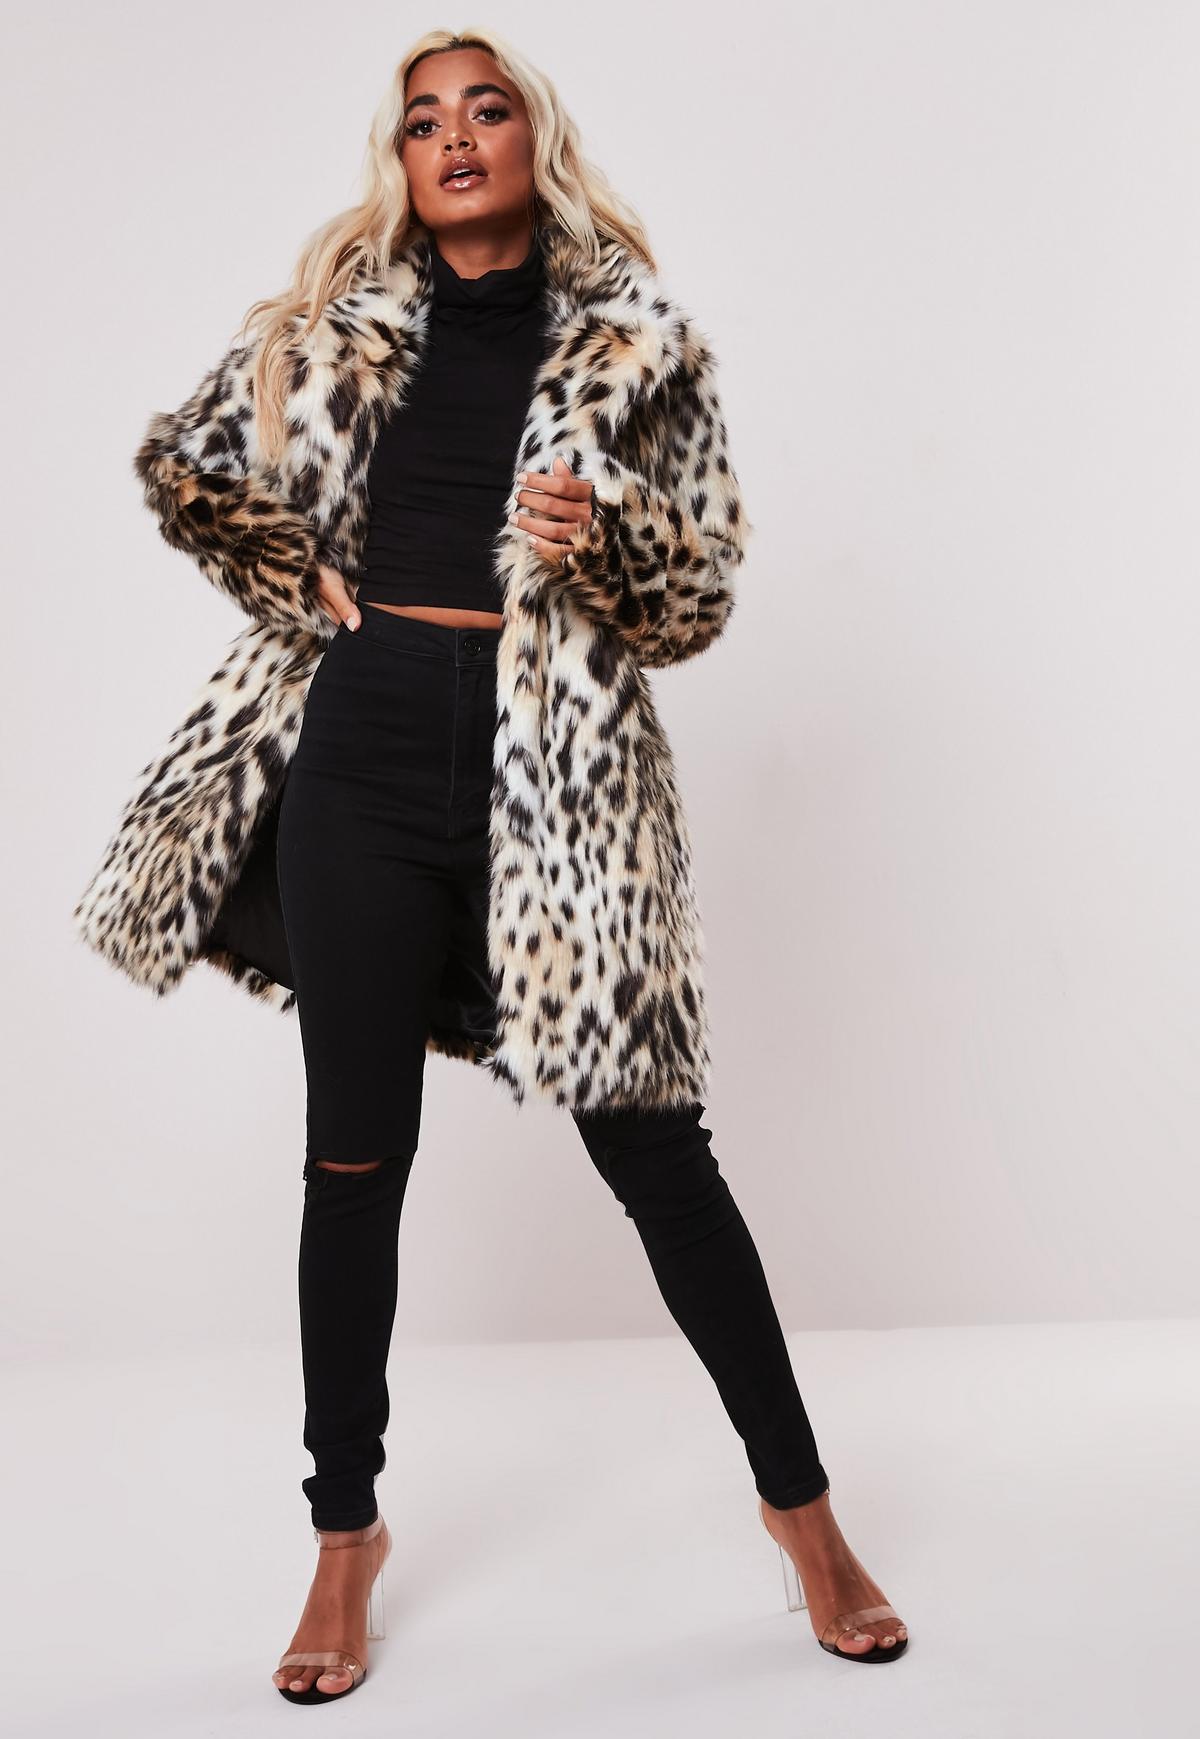 Ongekend Petite Nude Leopard Print Faux Fur Coat   Missguided SW-56